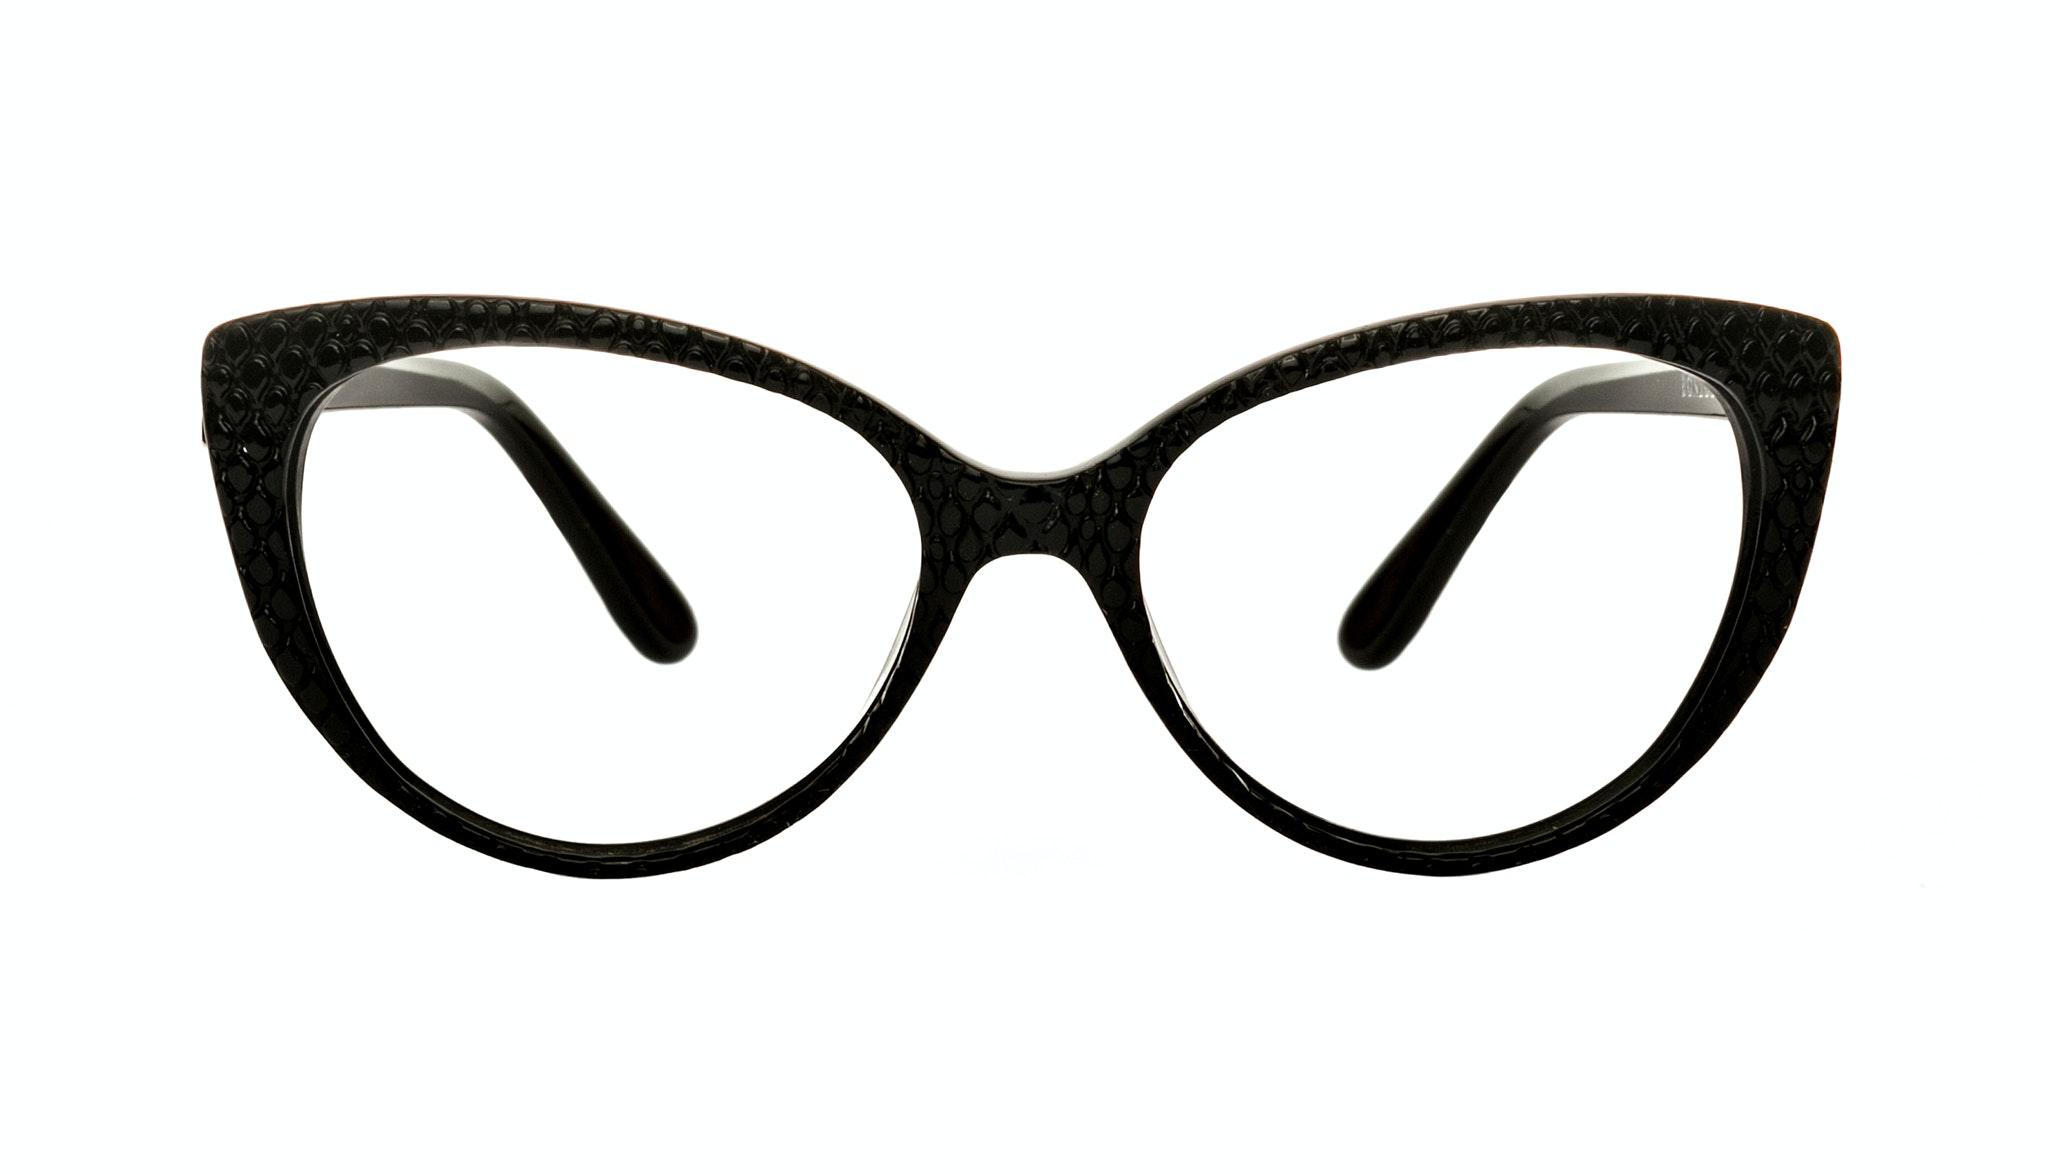 Affordable Fashion Glasses Cat Eye Eyeglasses Women Bliss Croco Front